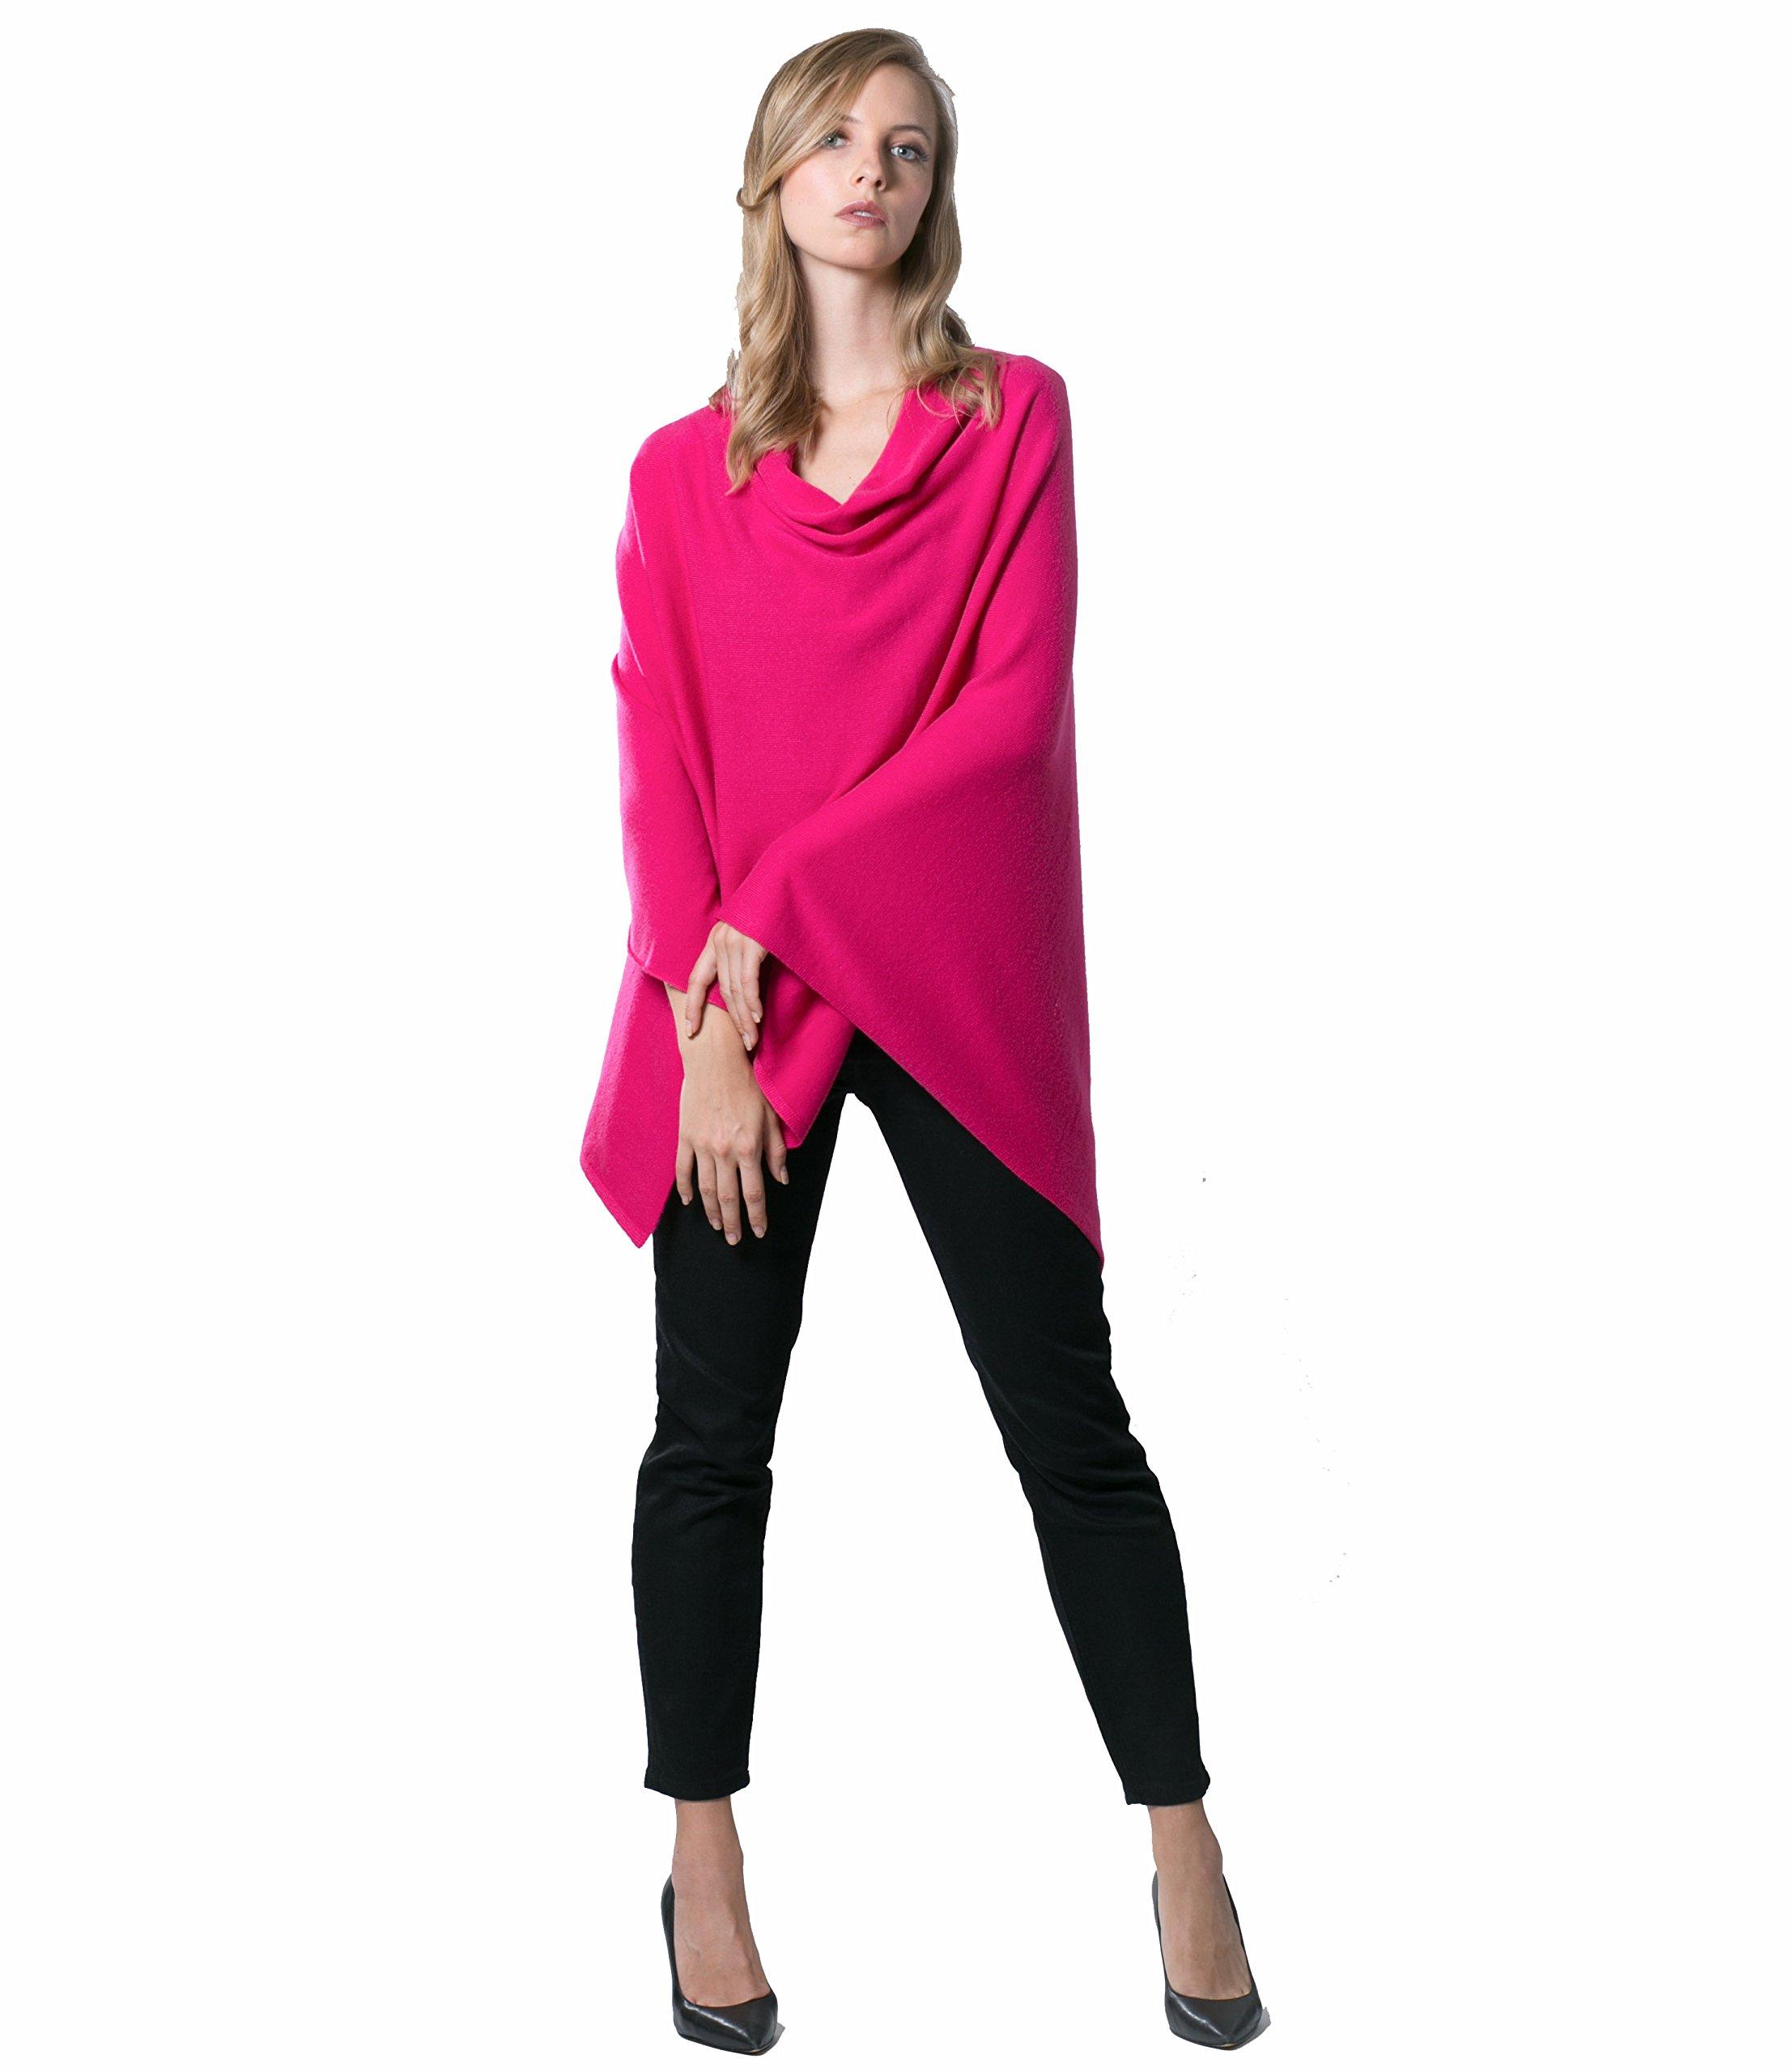 Super Soft Oversized 100% Cashmere Travel Blanket Scarf Wrap - Dragon Fruit Pink by Anna Kristine